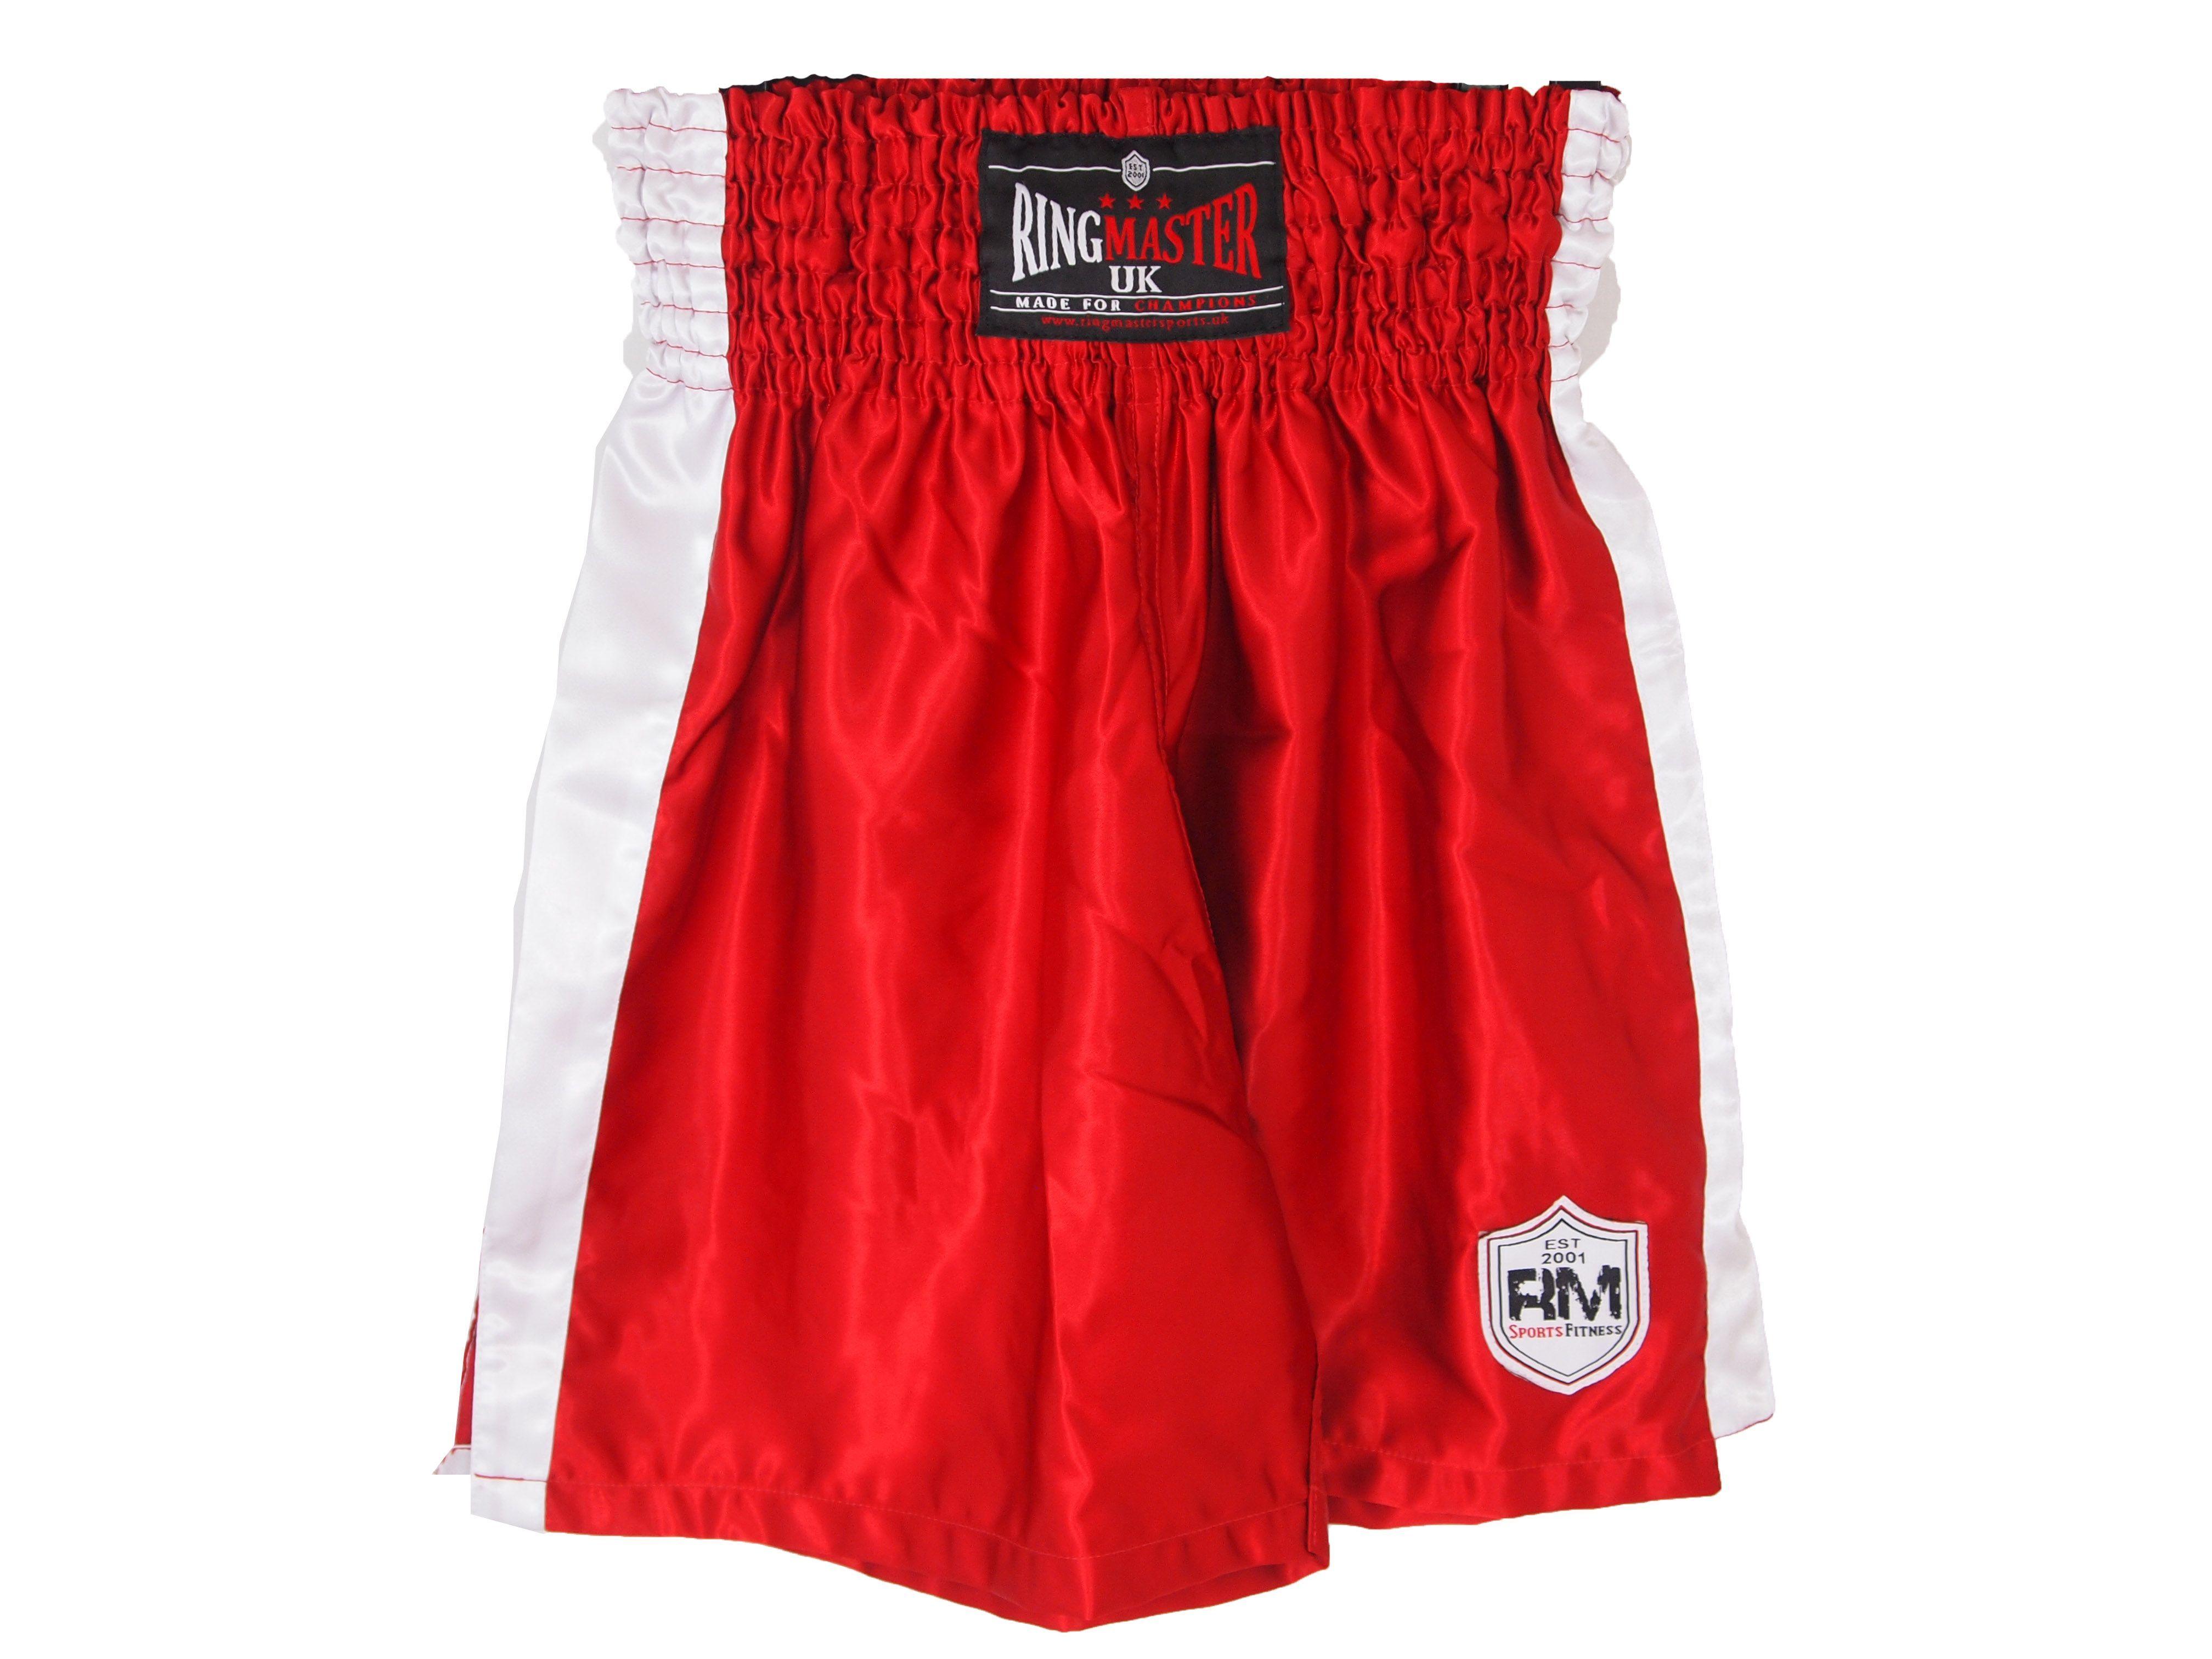 Ringmaster Uk Senior Boxing Shorts Red Mma Training Equipment Mma Training Boxing Equipment